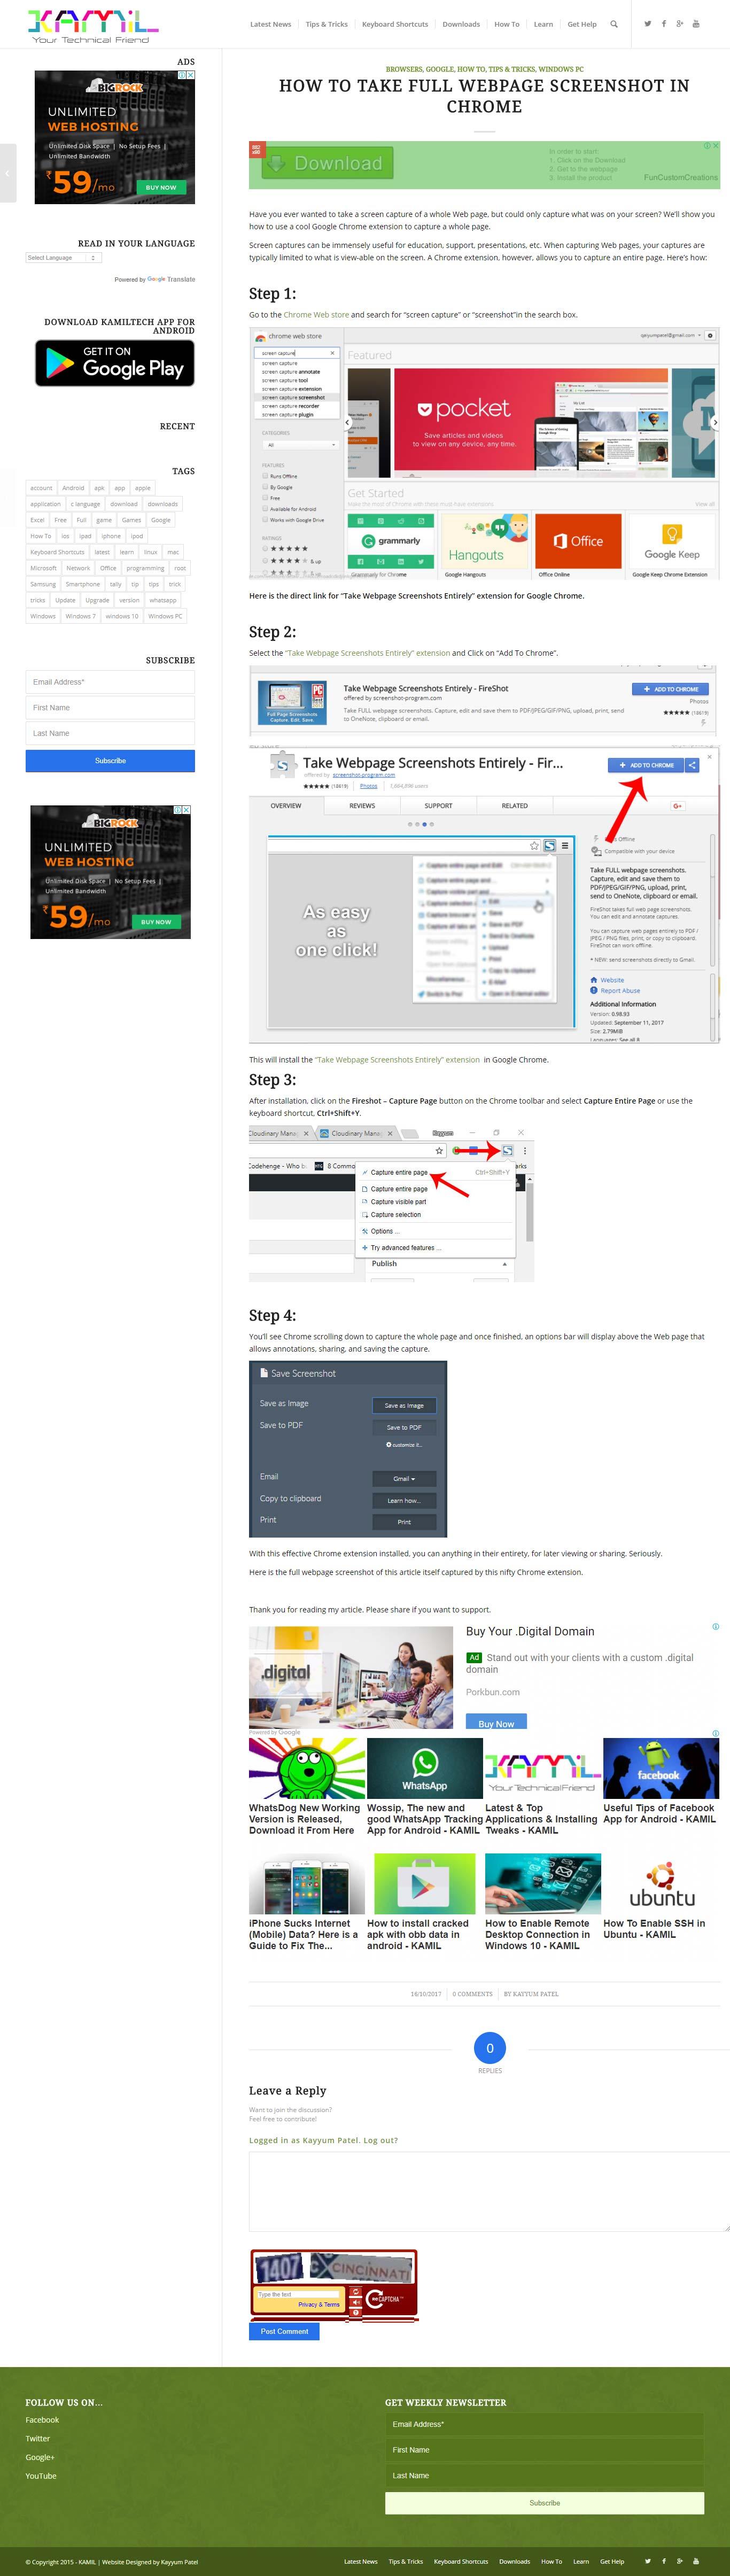 kamiltech.com - Screenshot of this article